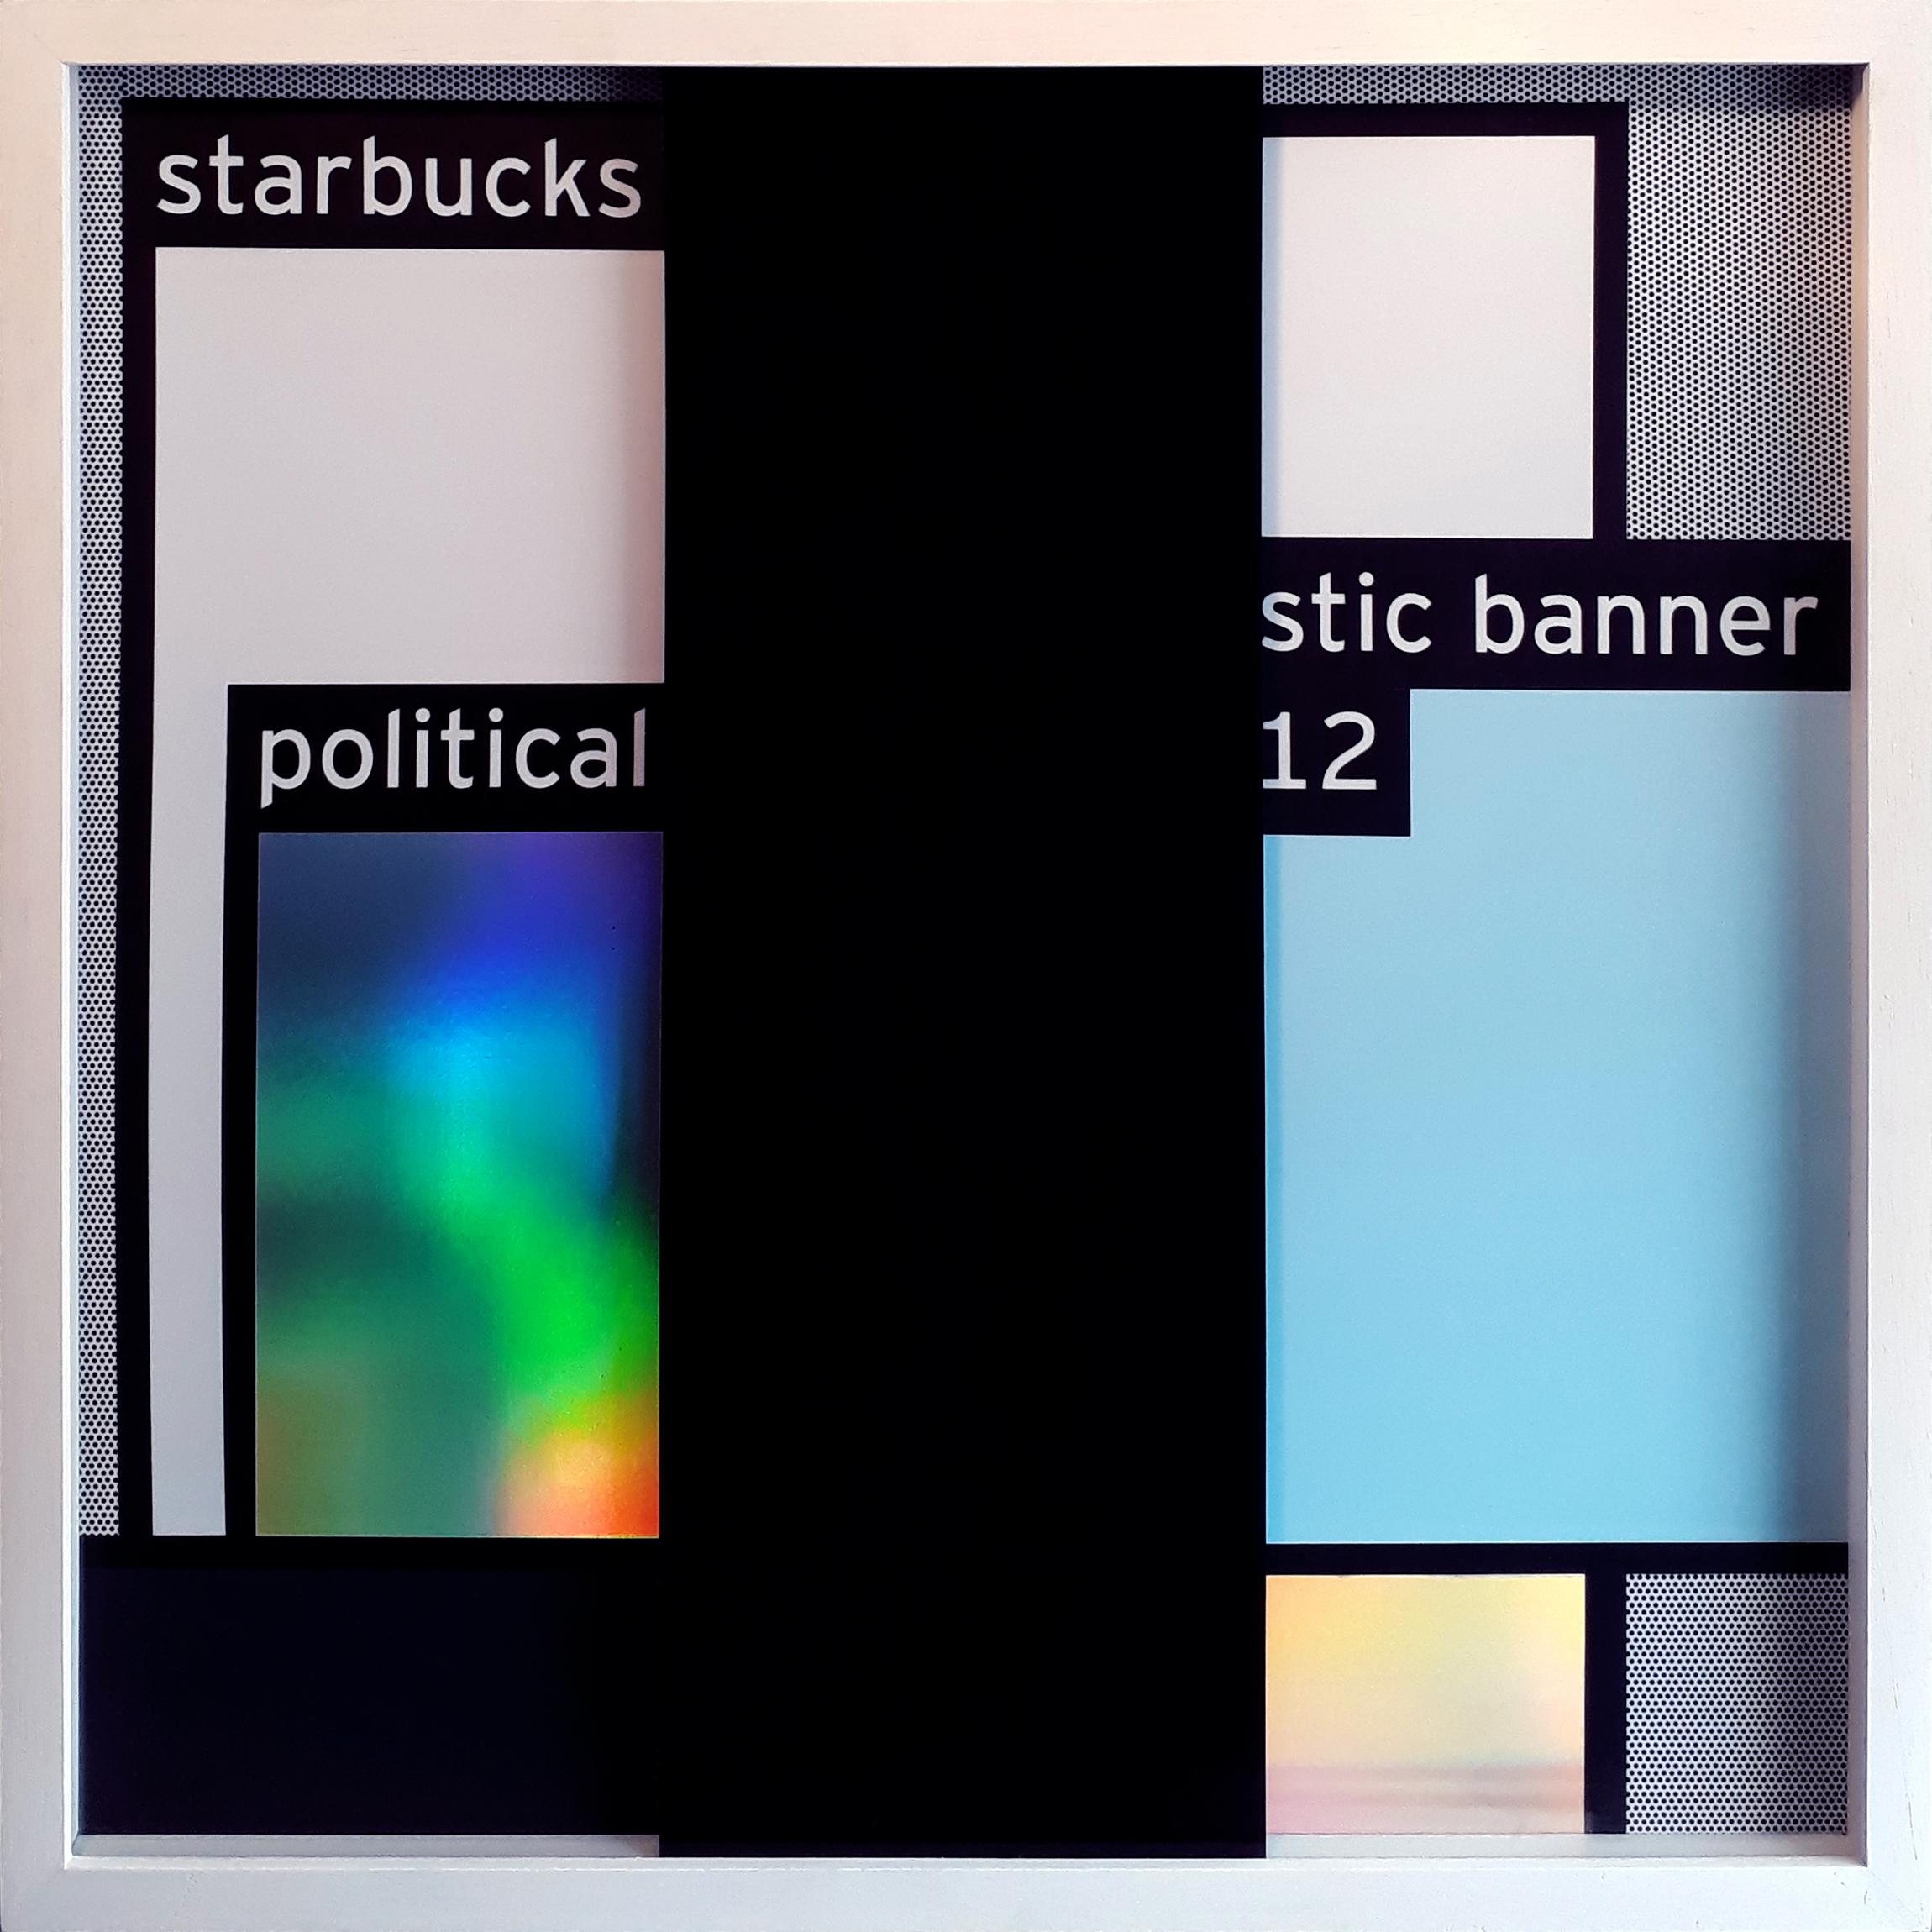 POLITICAL ACTIVIST 0.712